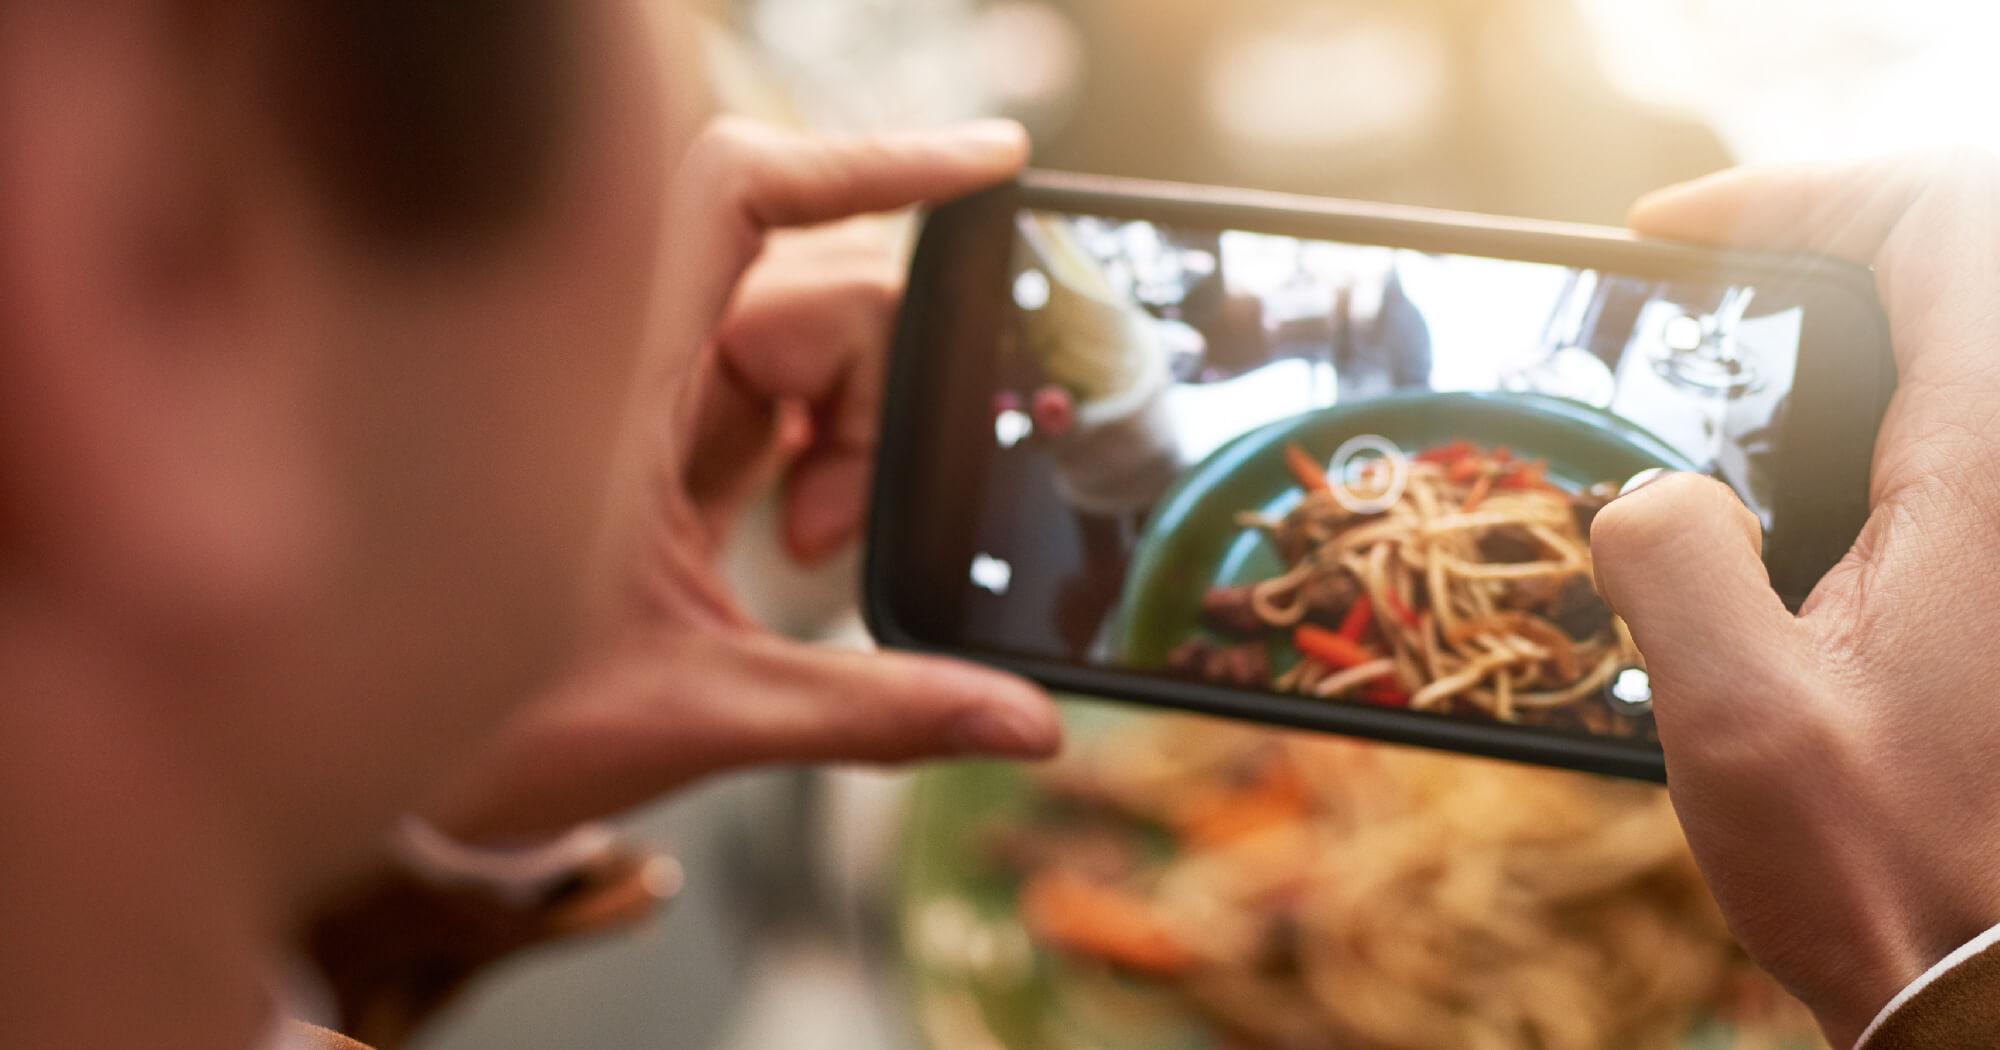 Foodie taking photos of food